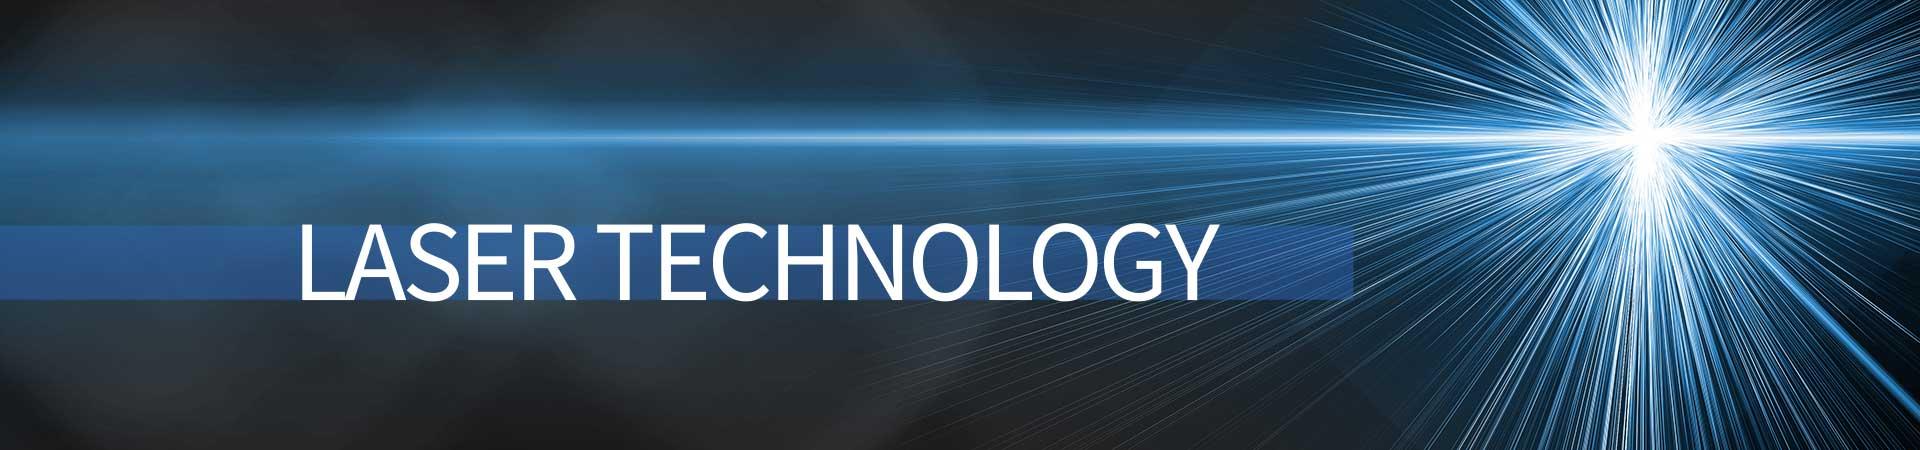 Laser_Technology